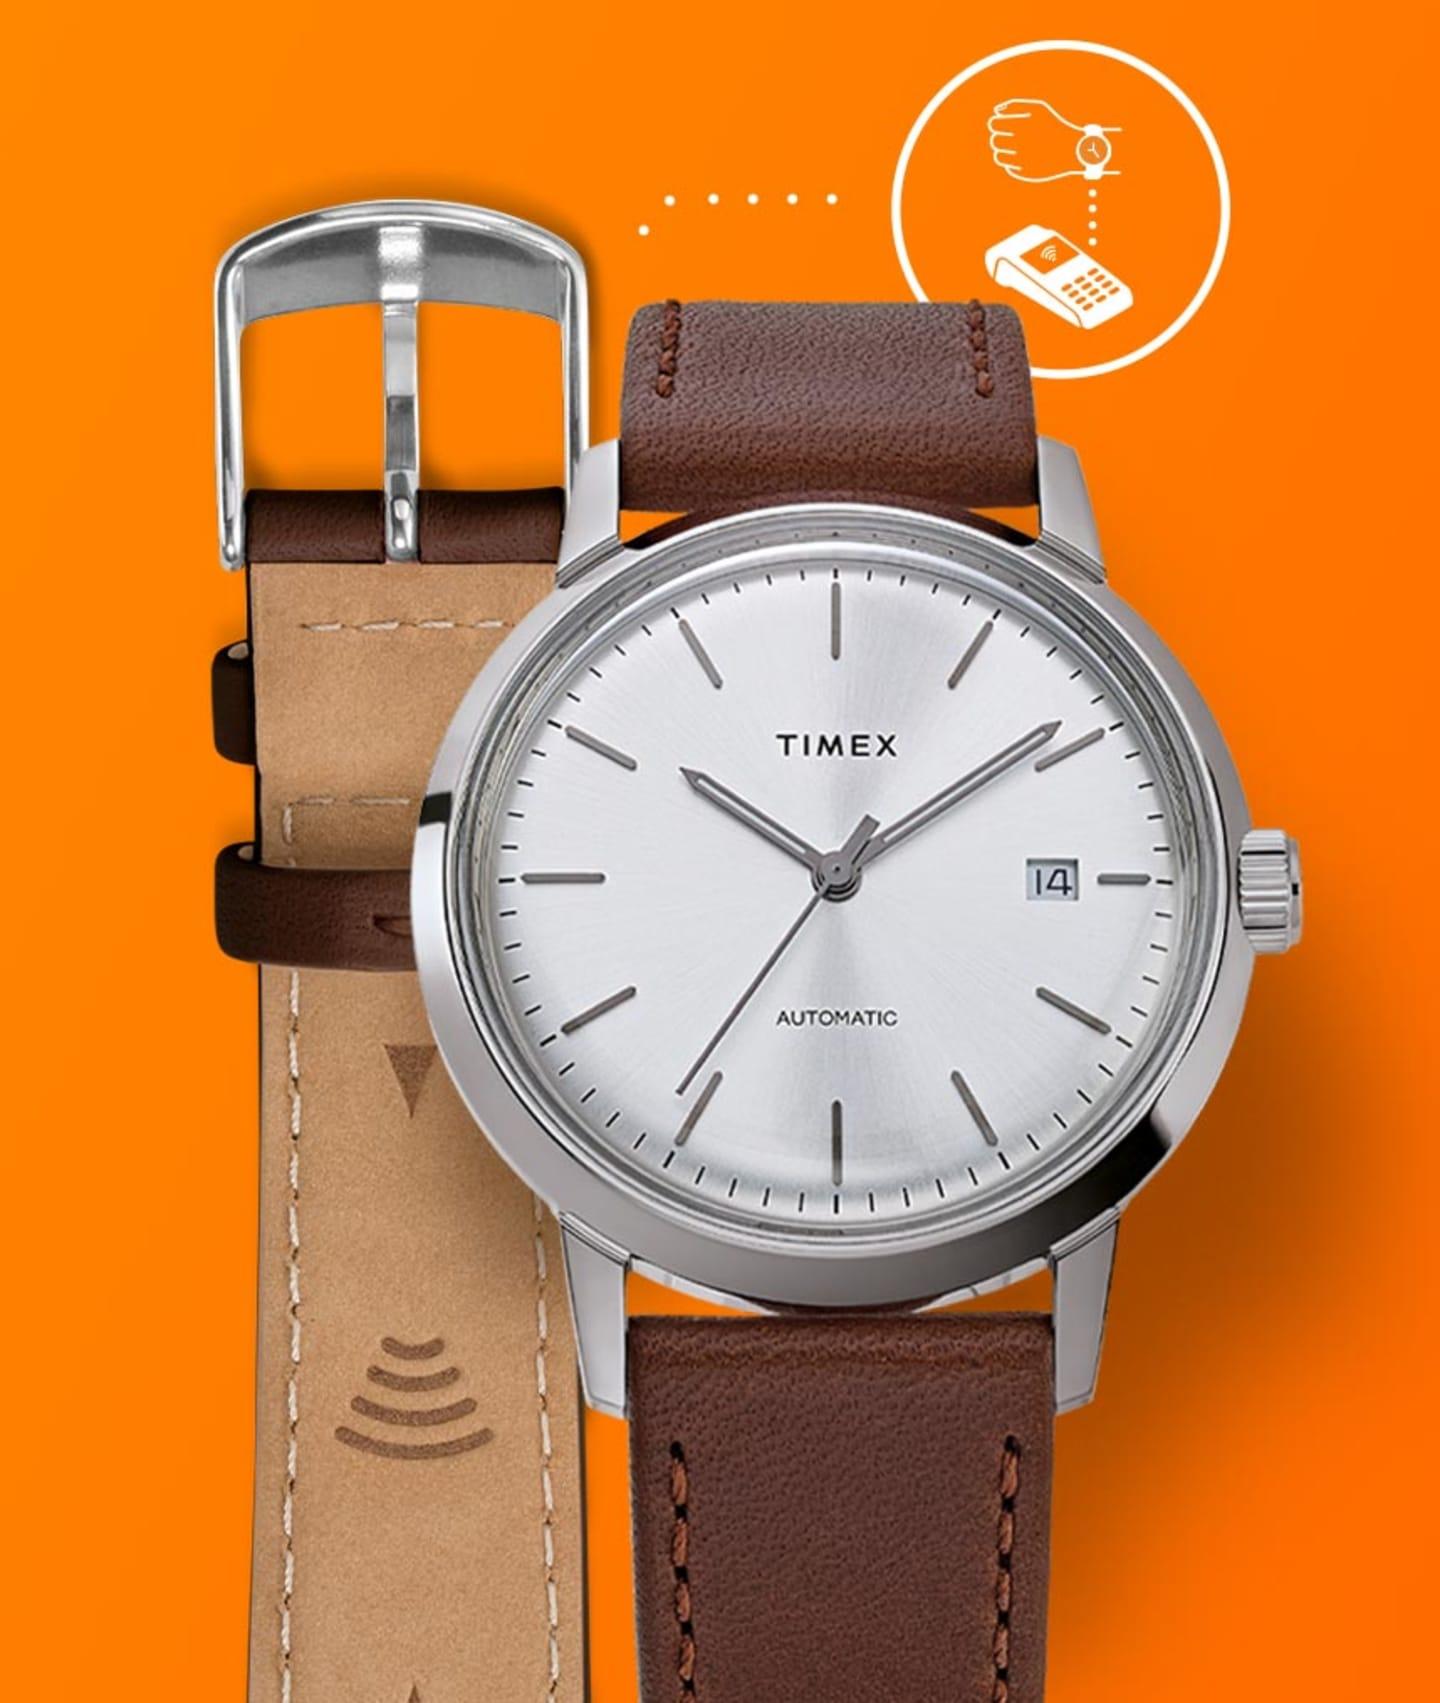 Timex Pay Watch.